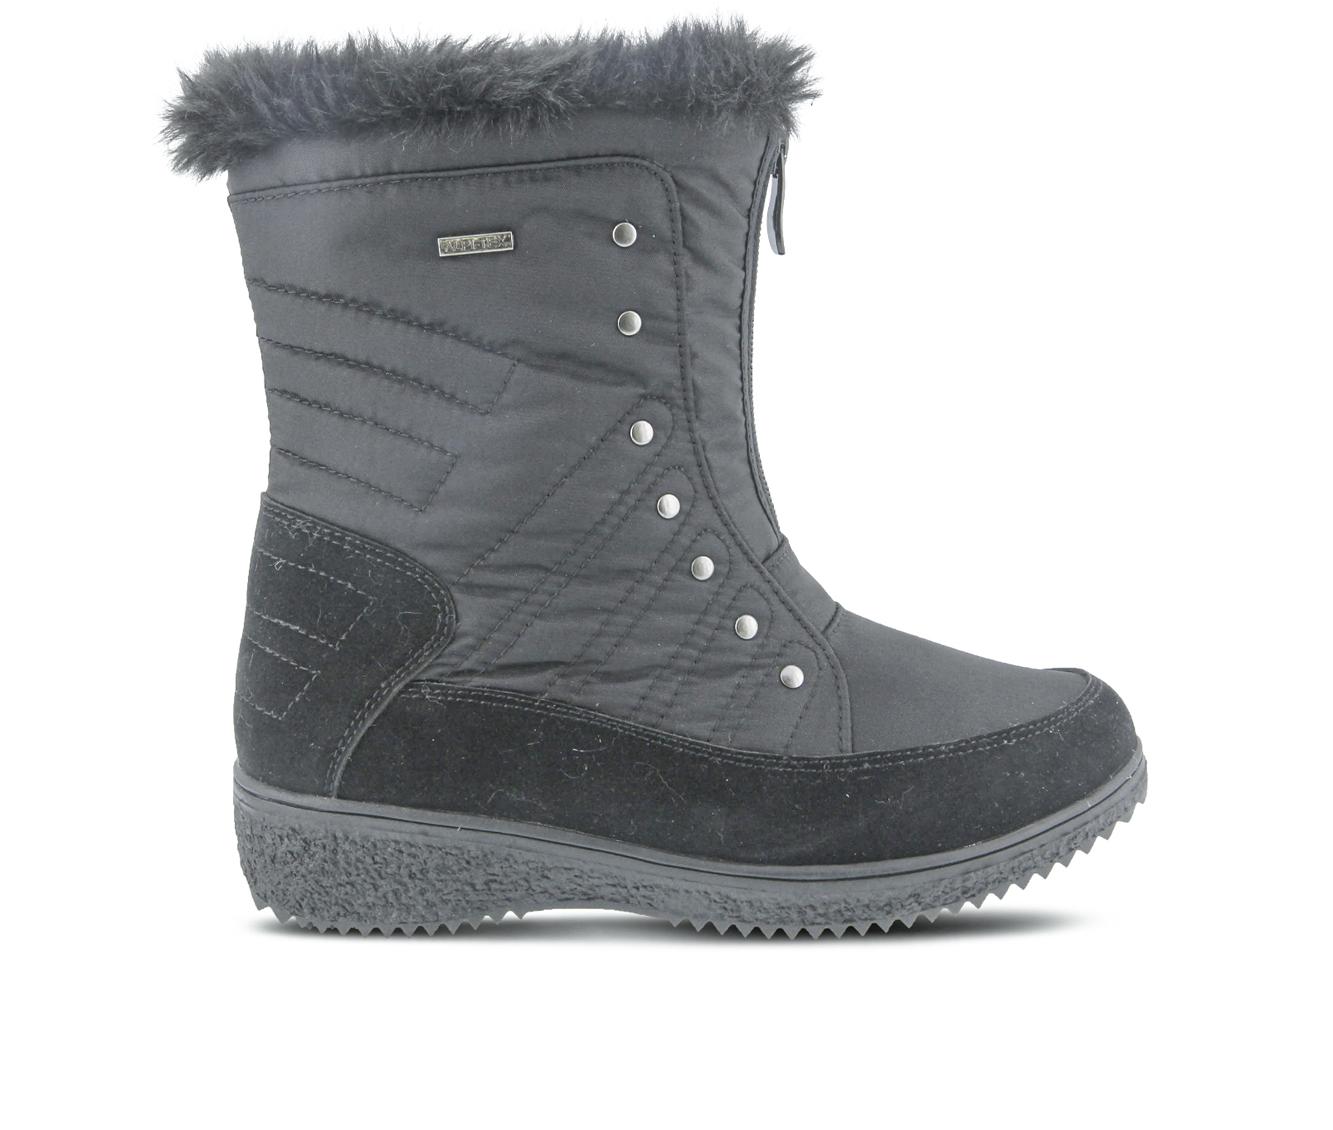 Flexus Imamu Women's Boots (Black - Size EU 39 / US 8.5)